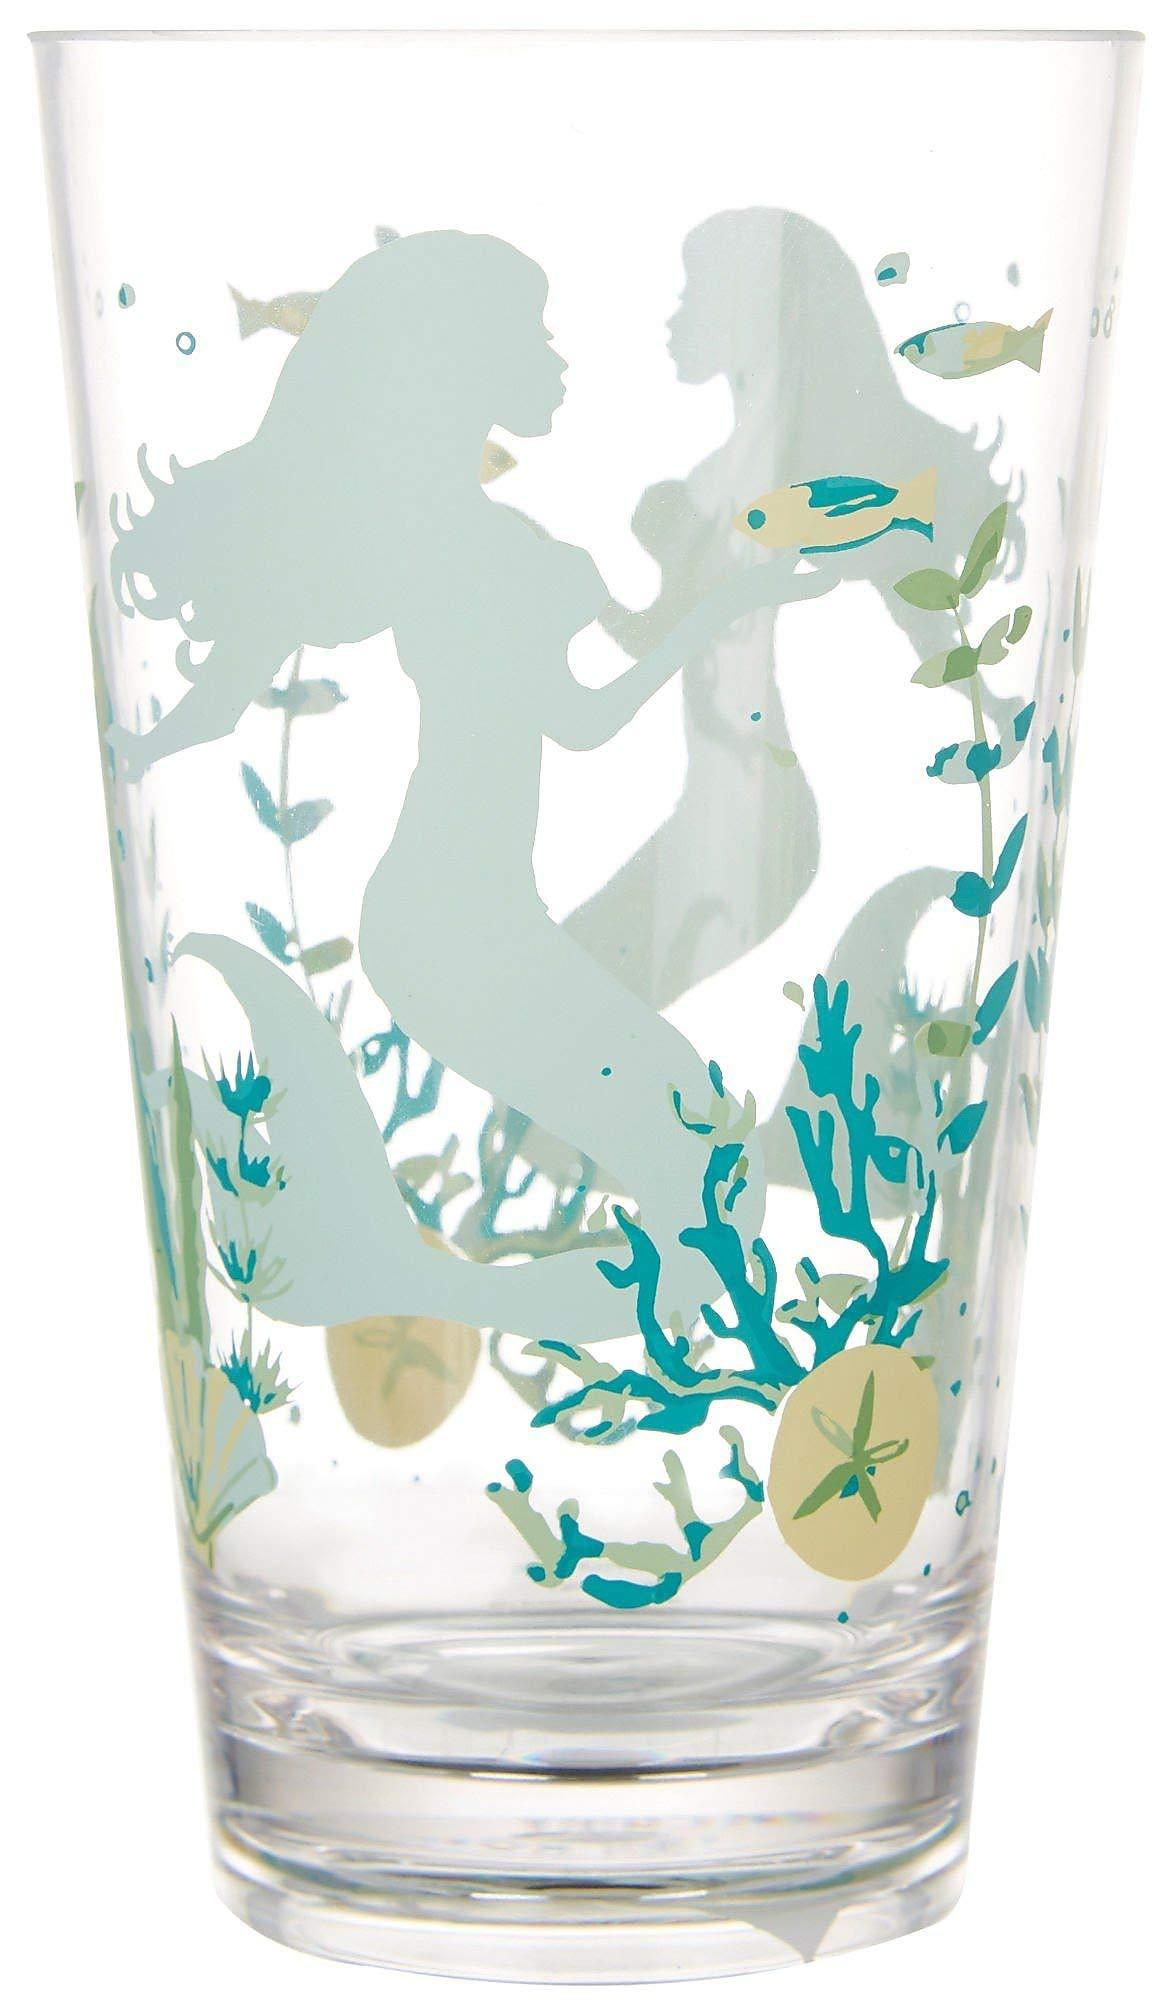 Tropix 22 oz. Mermaid Wishes Highball Glass One Size Aqua blue/yellow